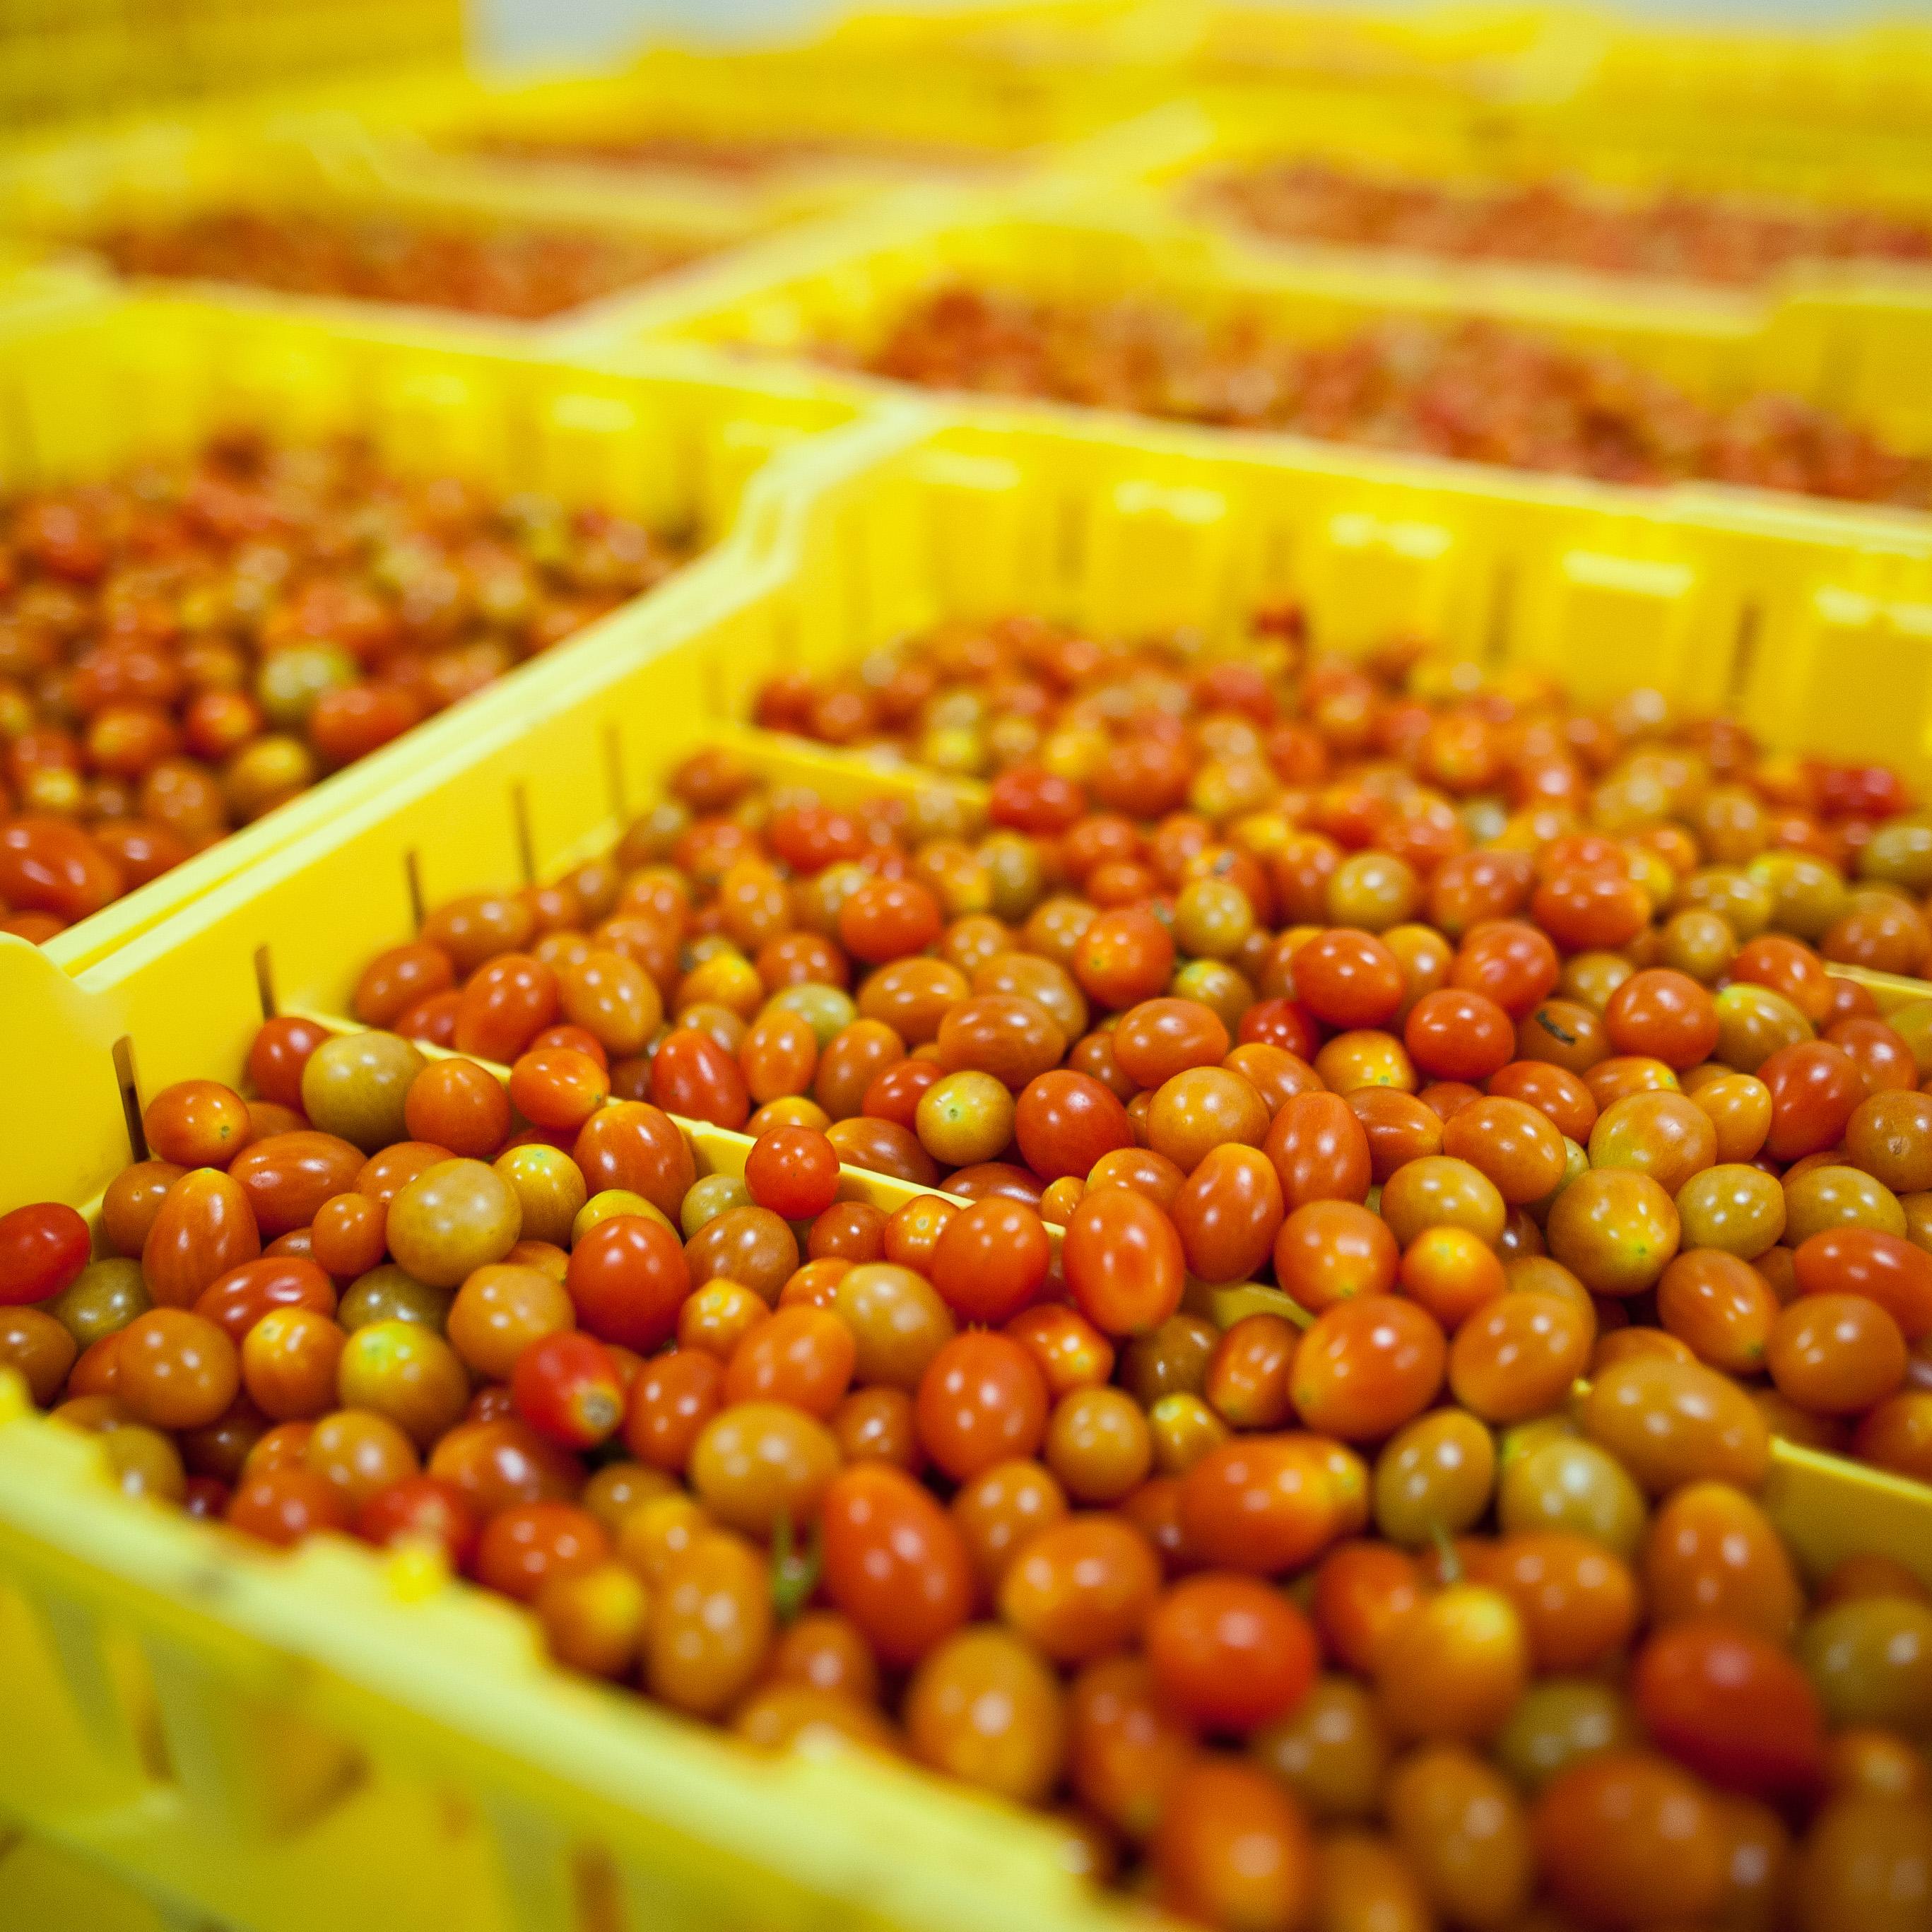 Country Magic Grape Tomatoes in bulk storage